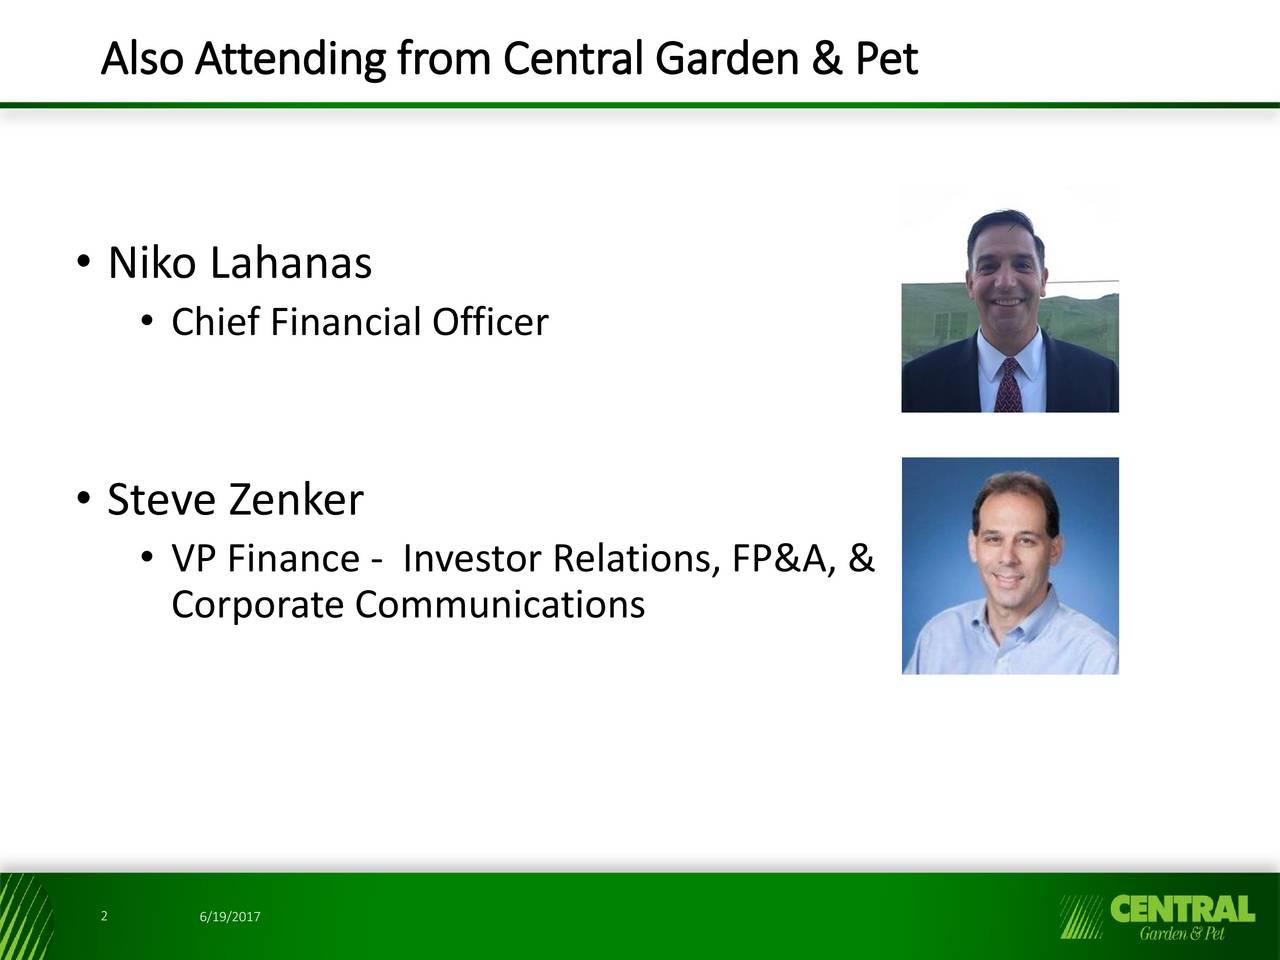 2017 niko lahanas chief financial officer steve zenker vp finance investor relations fpa safe - Central Garden And Pet